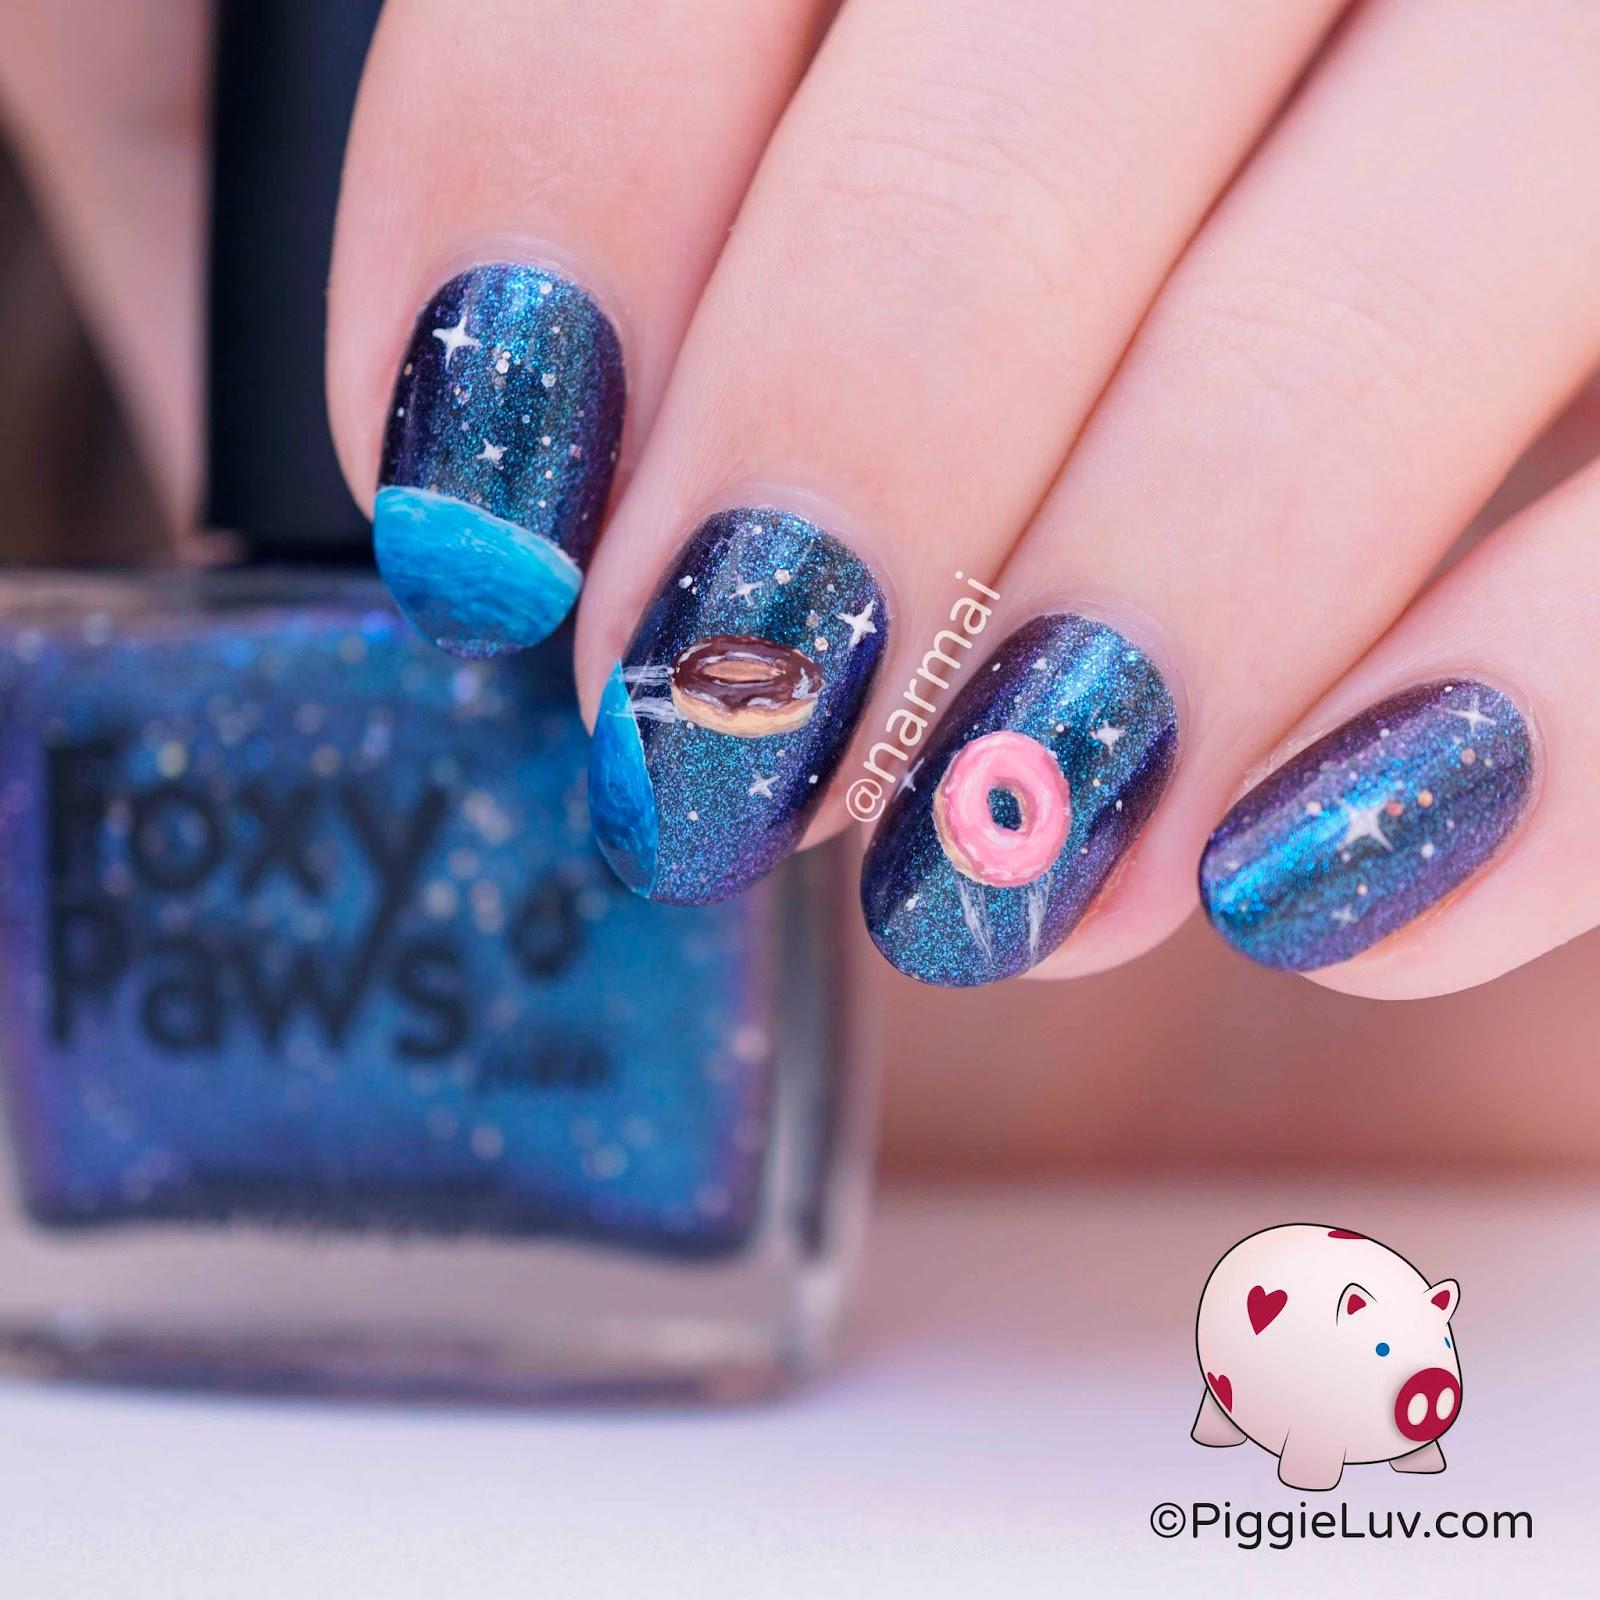 Galaxy Nail Polish Design: Foxy Paws Polish